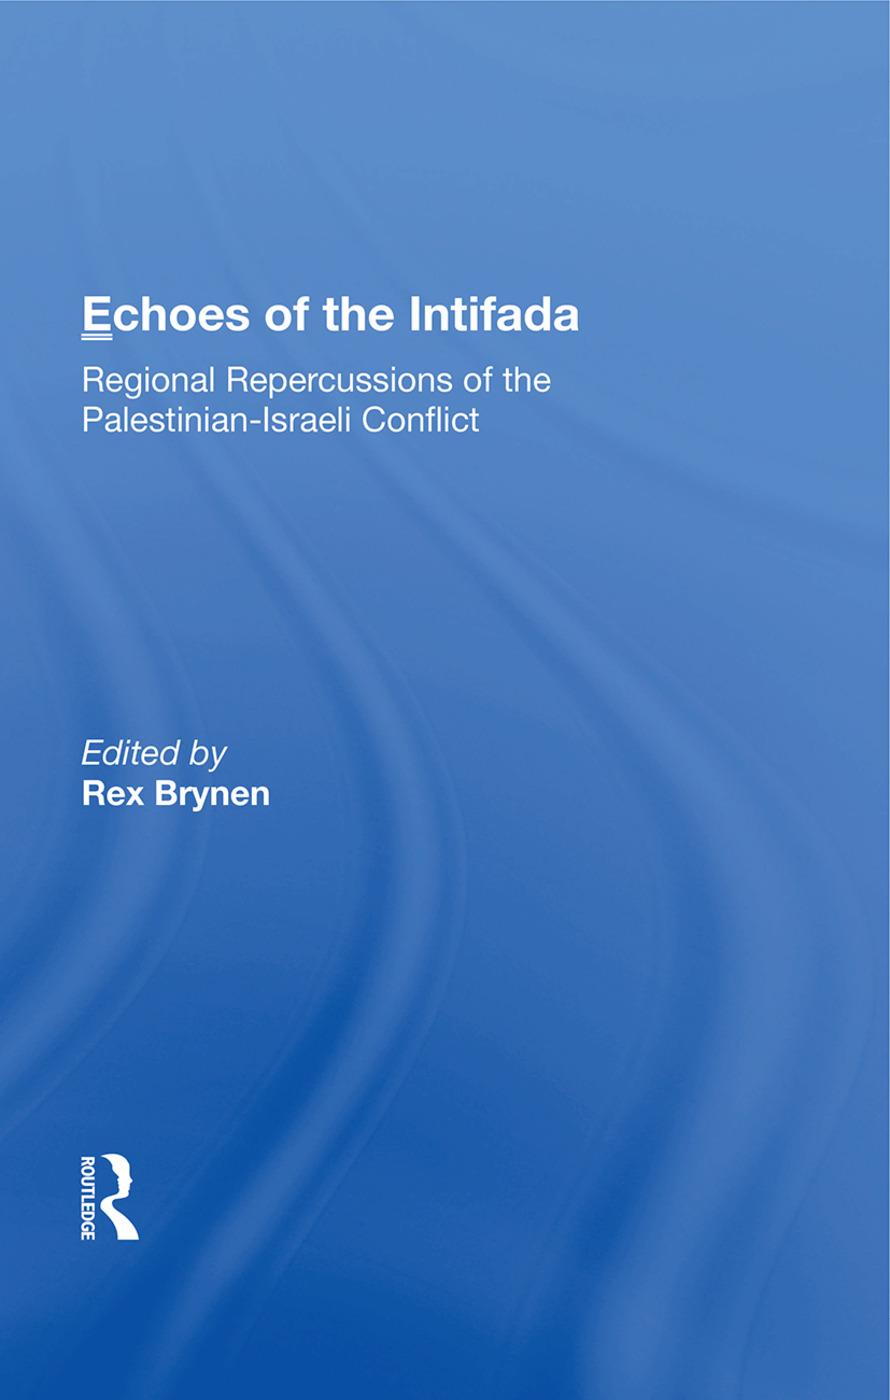 Echoes of the Intifada